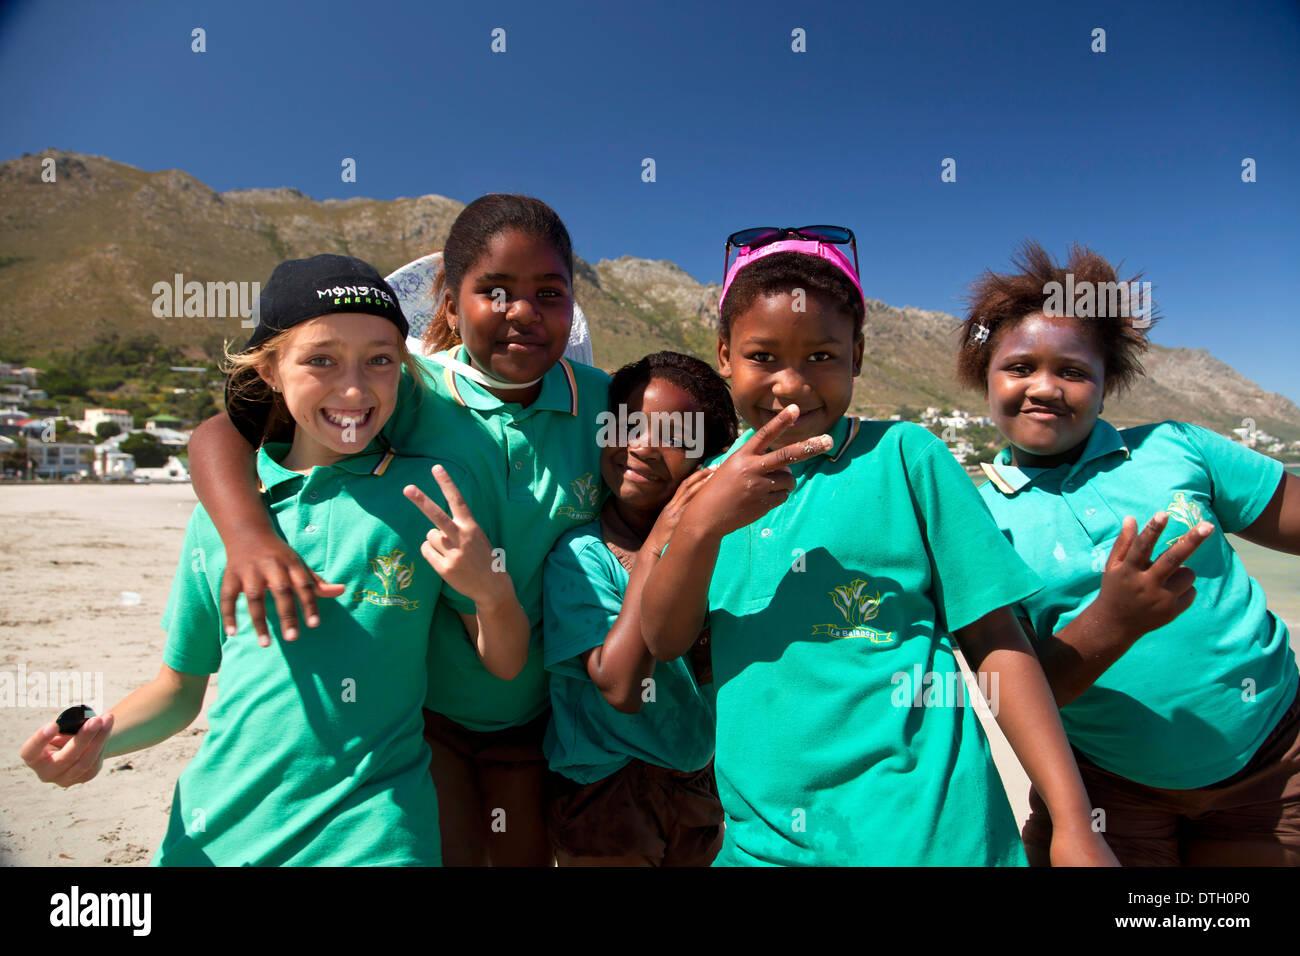 Schoolchildren in Gordon's Bay, Western Cape, South Africa Stock Photo